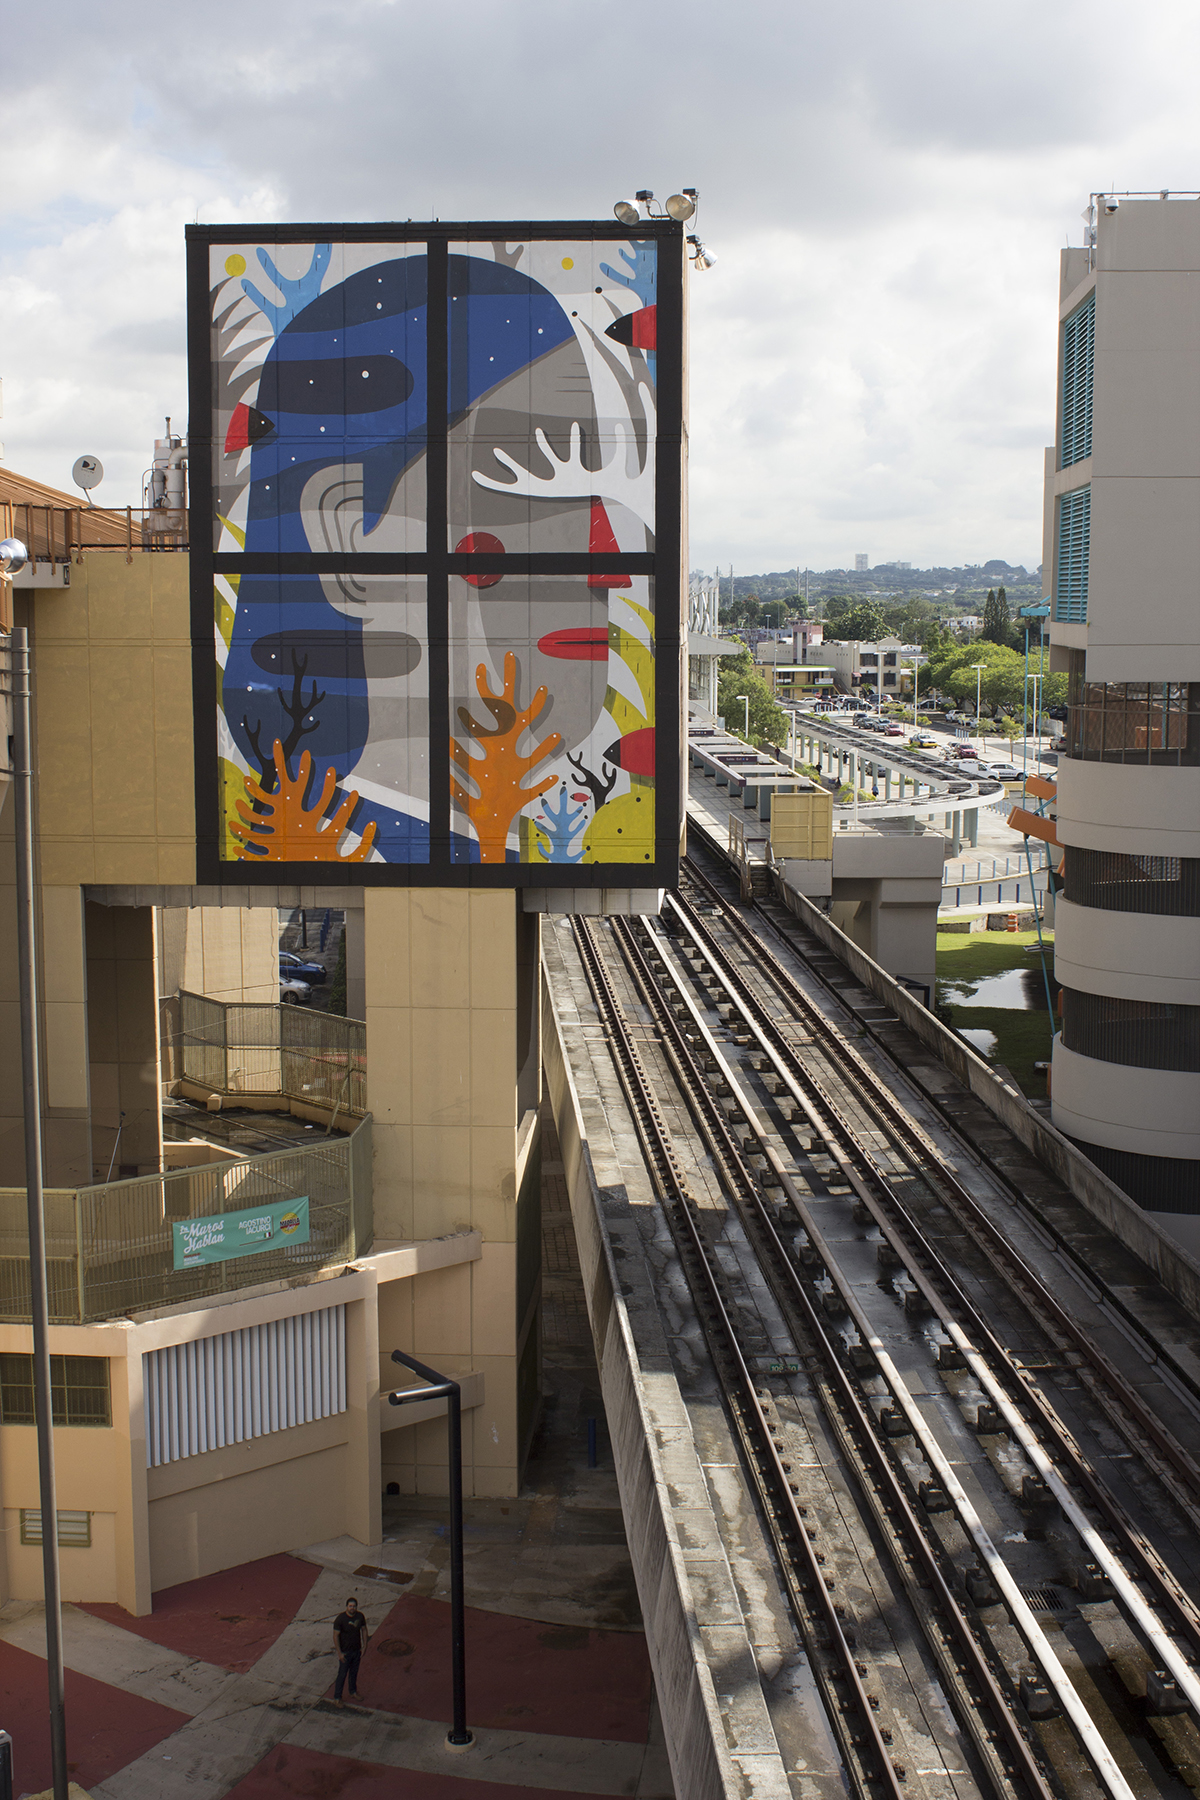 agostino-iacurci-the-window-in-bayamon-puerto-rico-03